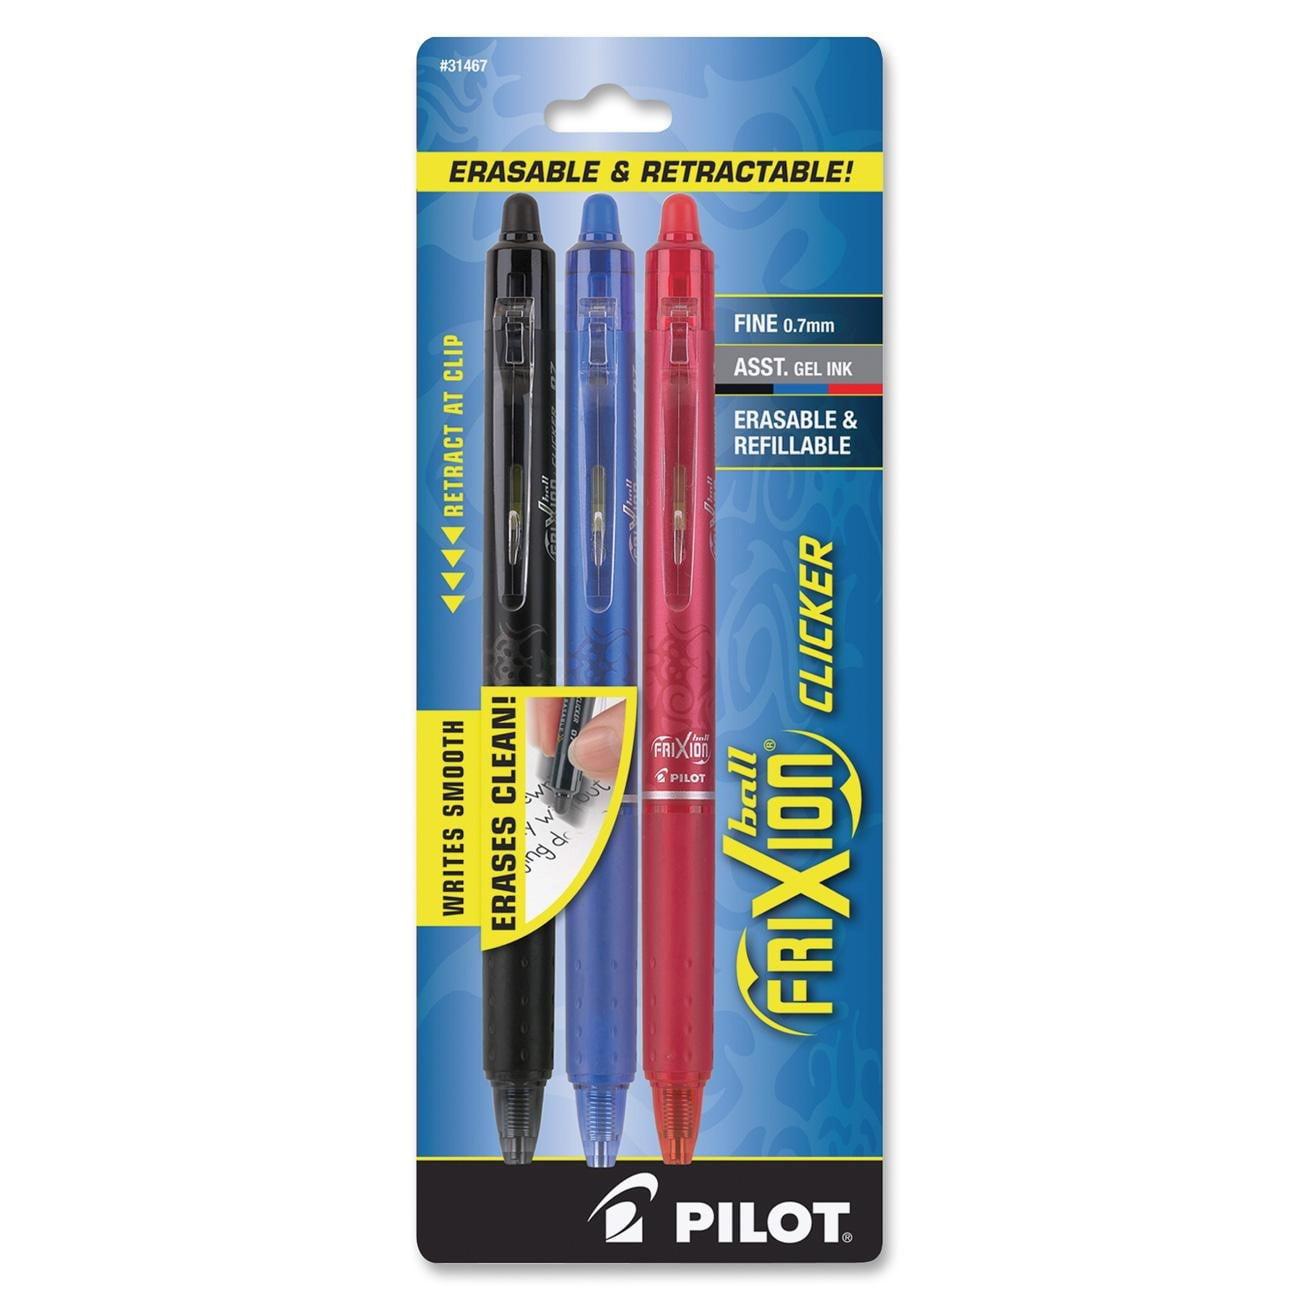 Pilot FriXion Ball Clicker Erasable Gel Ink Pen, Fine Point, Assorted Ink, 3-Pack